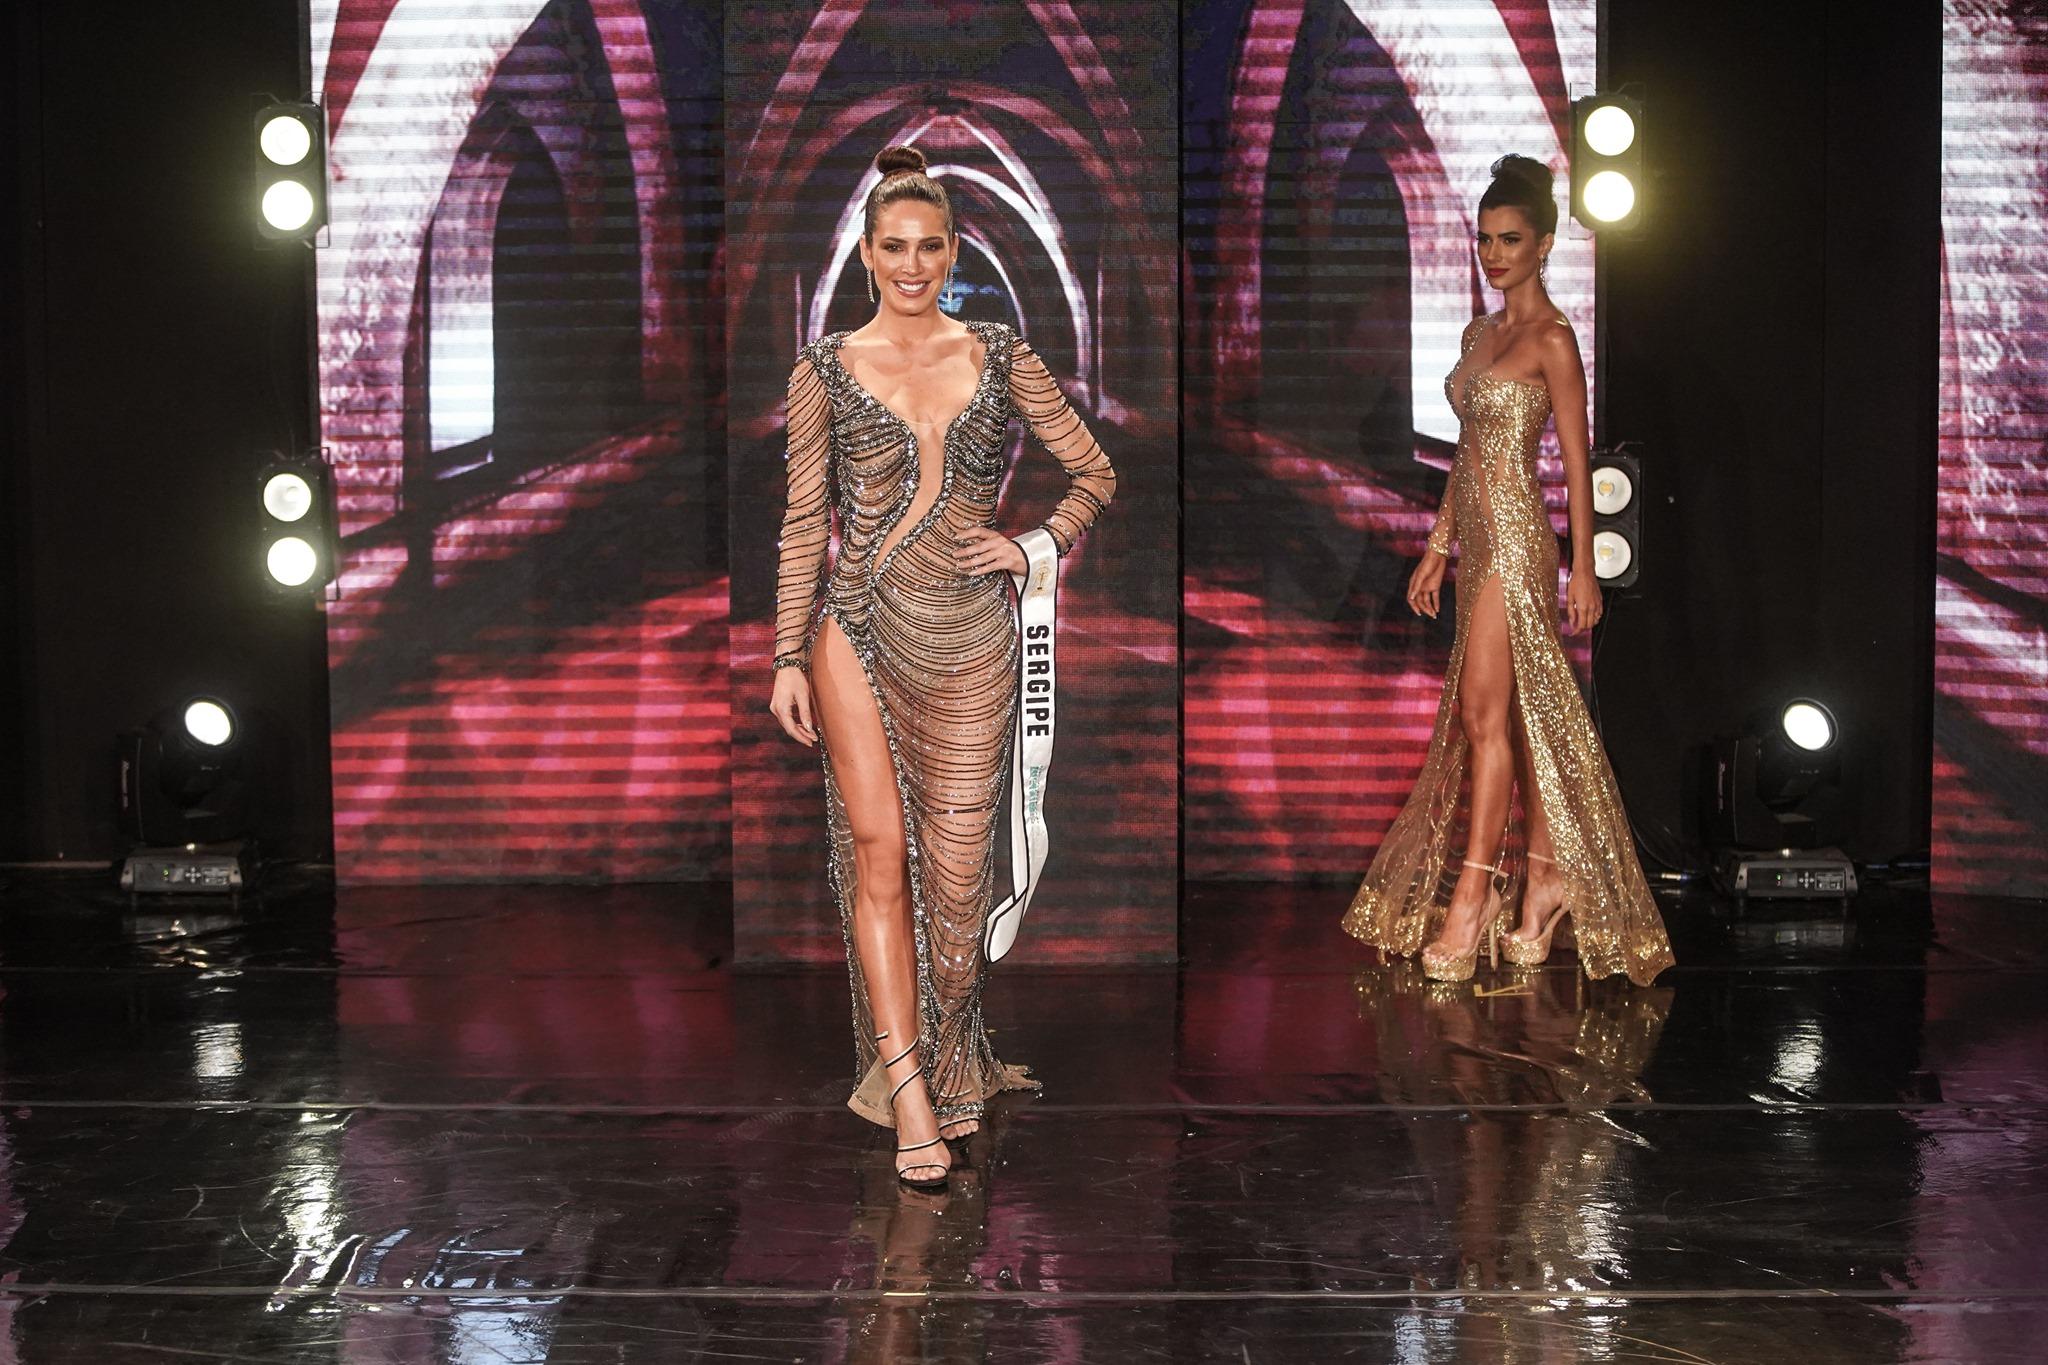 bruna zanardo, 1st runner-up de miss supranational brazil 2020/miss brasil internacional 2017/miss brasil terra 2016. - Página 18 12951210